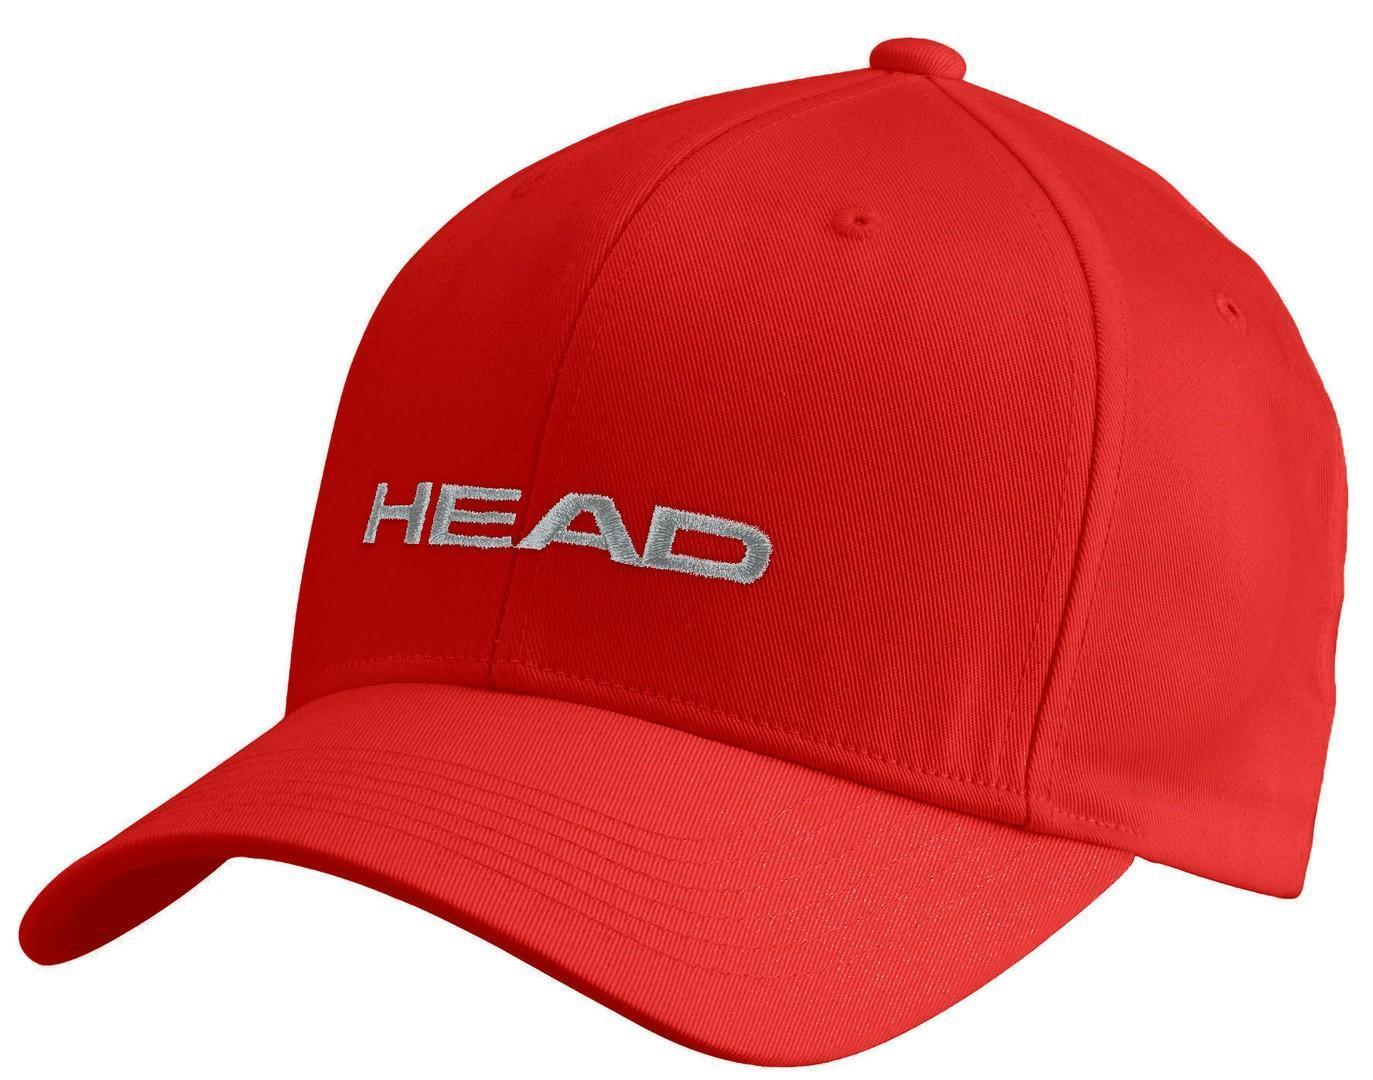 Теннисная кепка Head Promotion Cap red